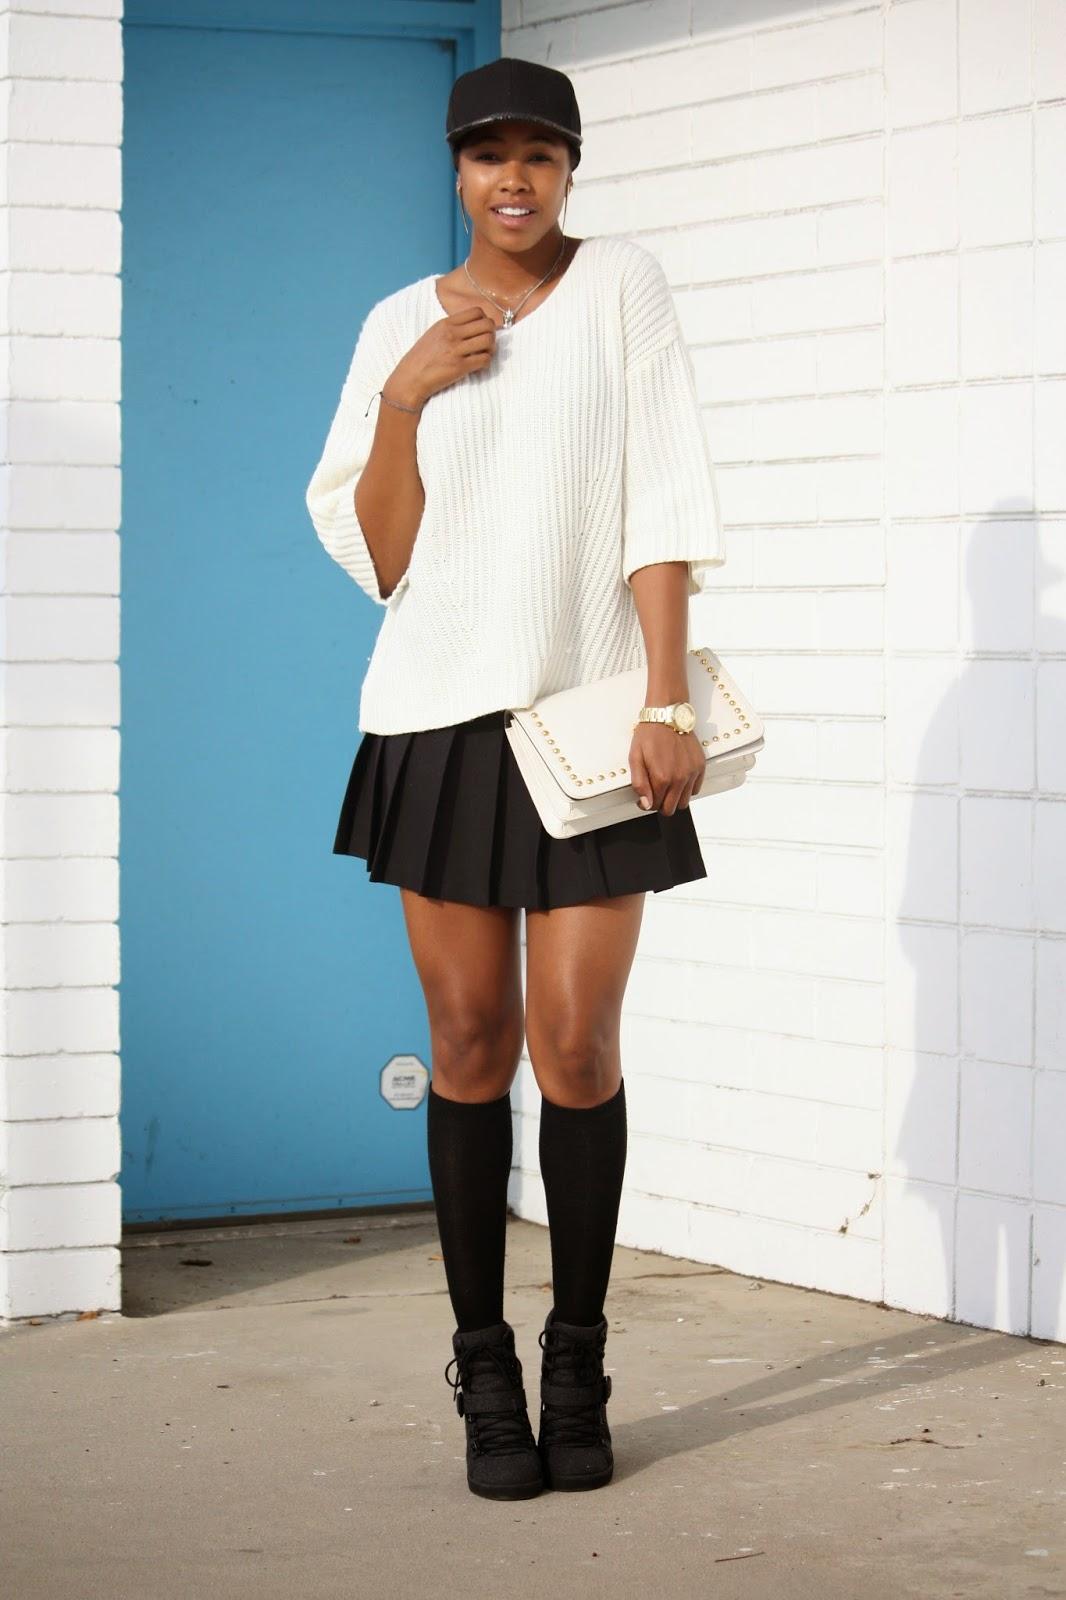 skirt and heels Tennis